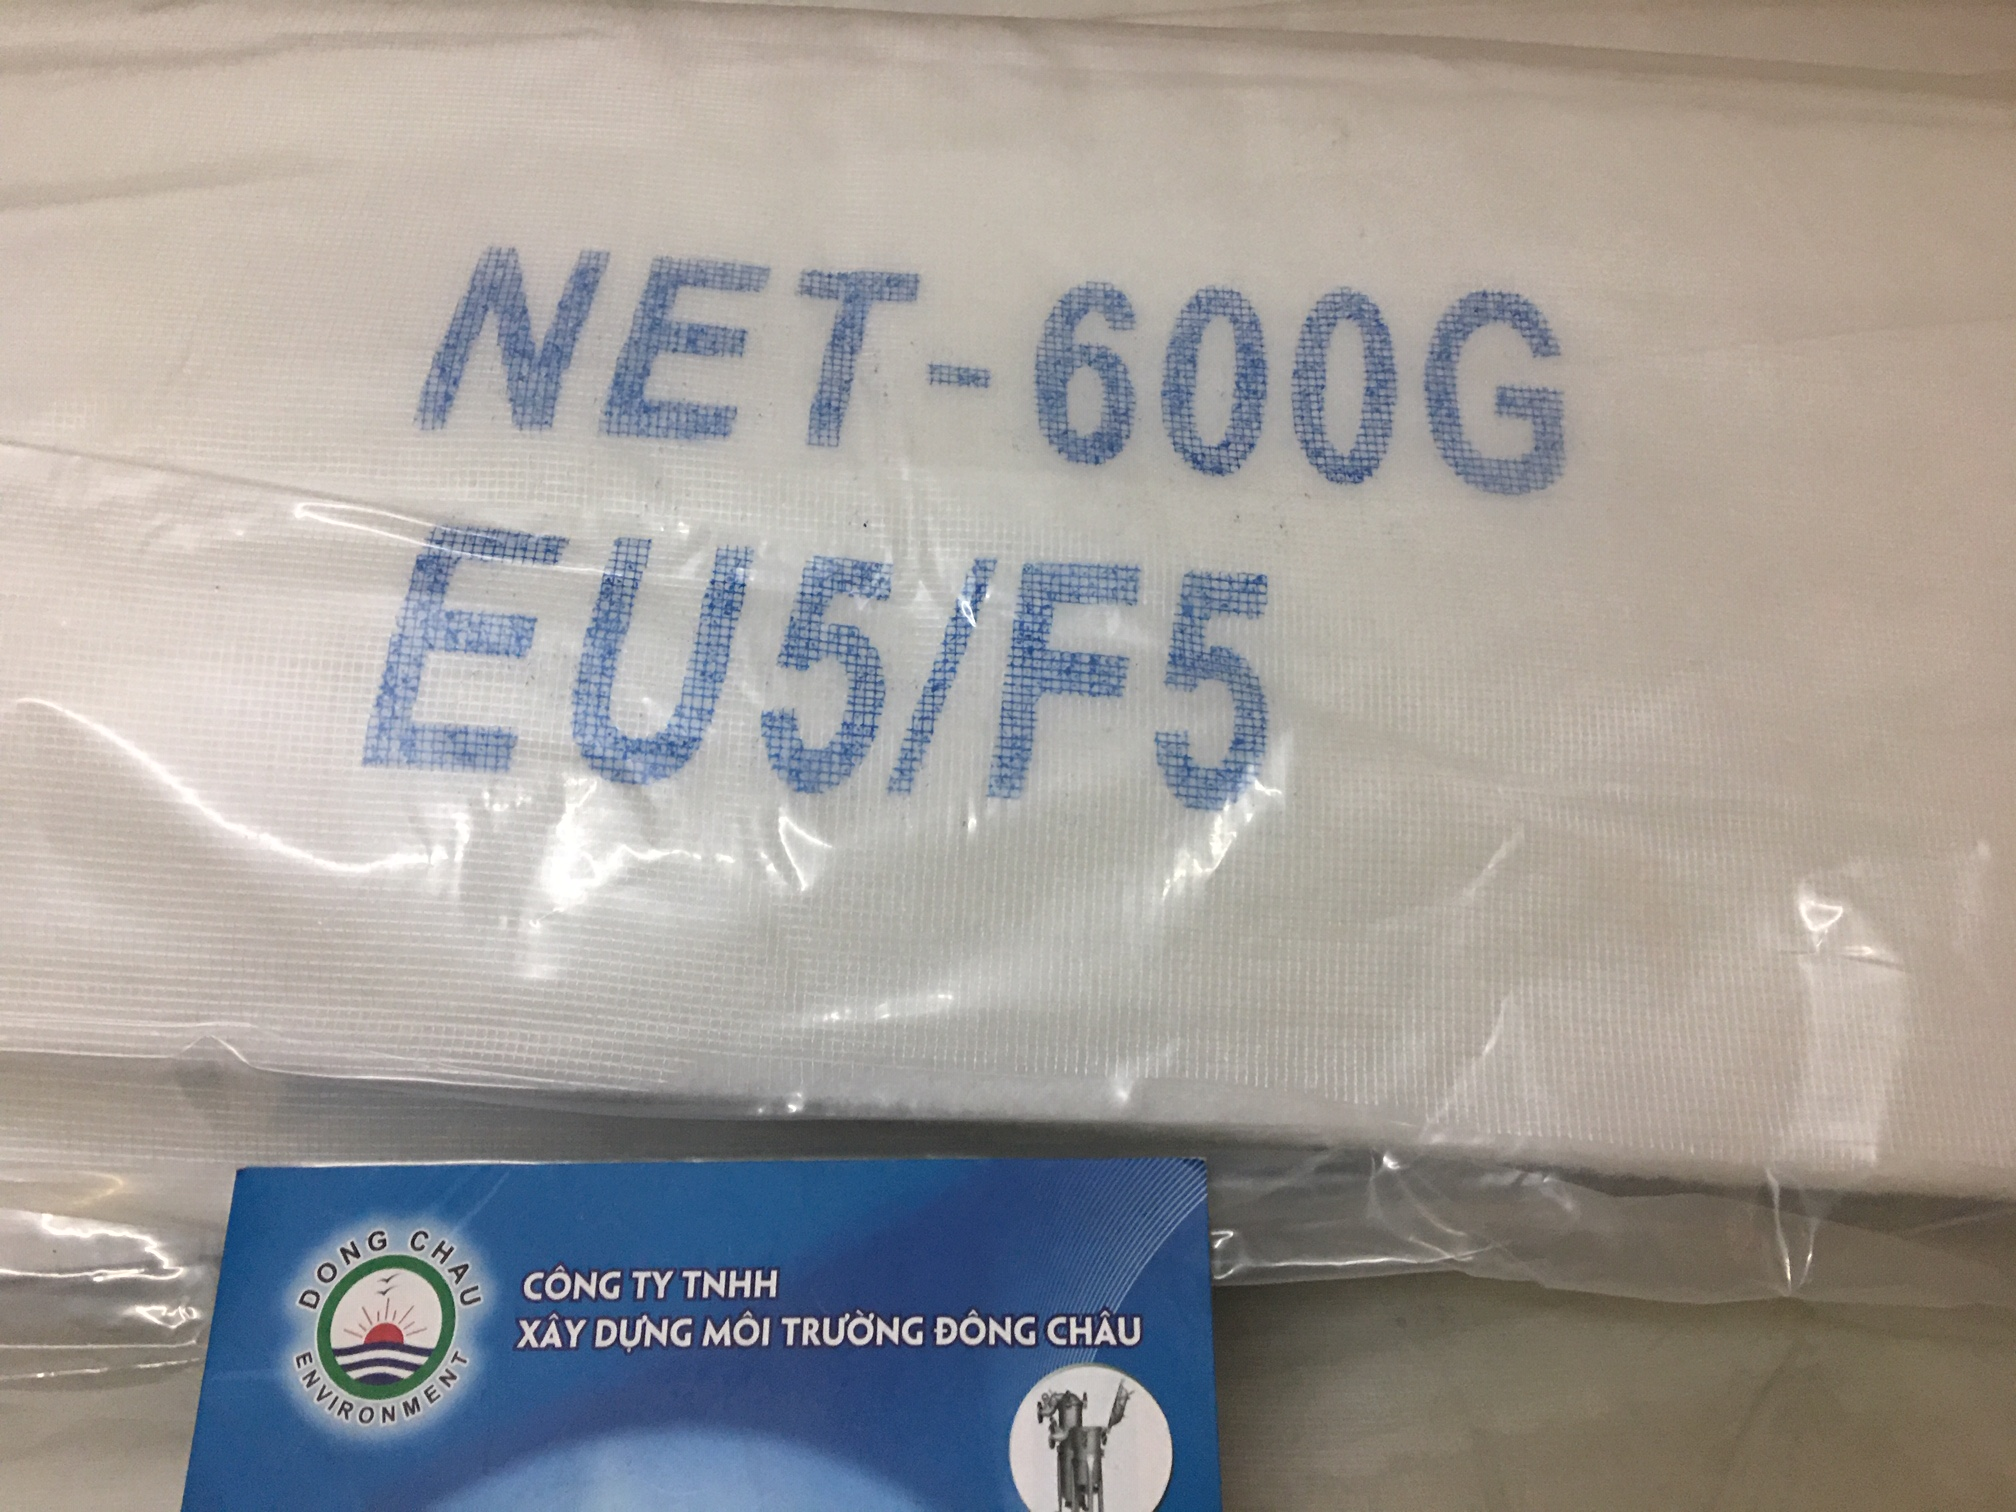 Bông Lọc Trần Phòng Sơn F5 Ceiling Fiber Synthetic For Air Filtering